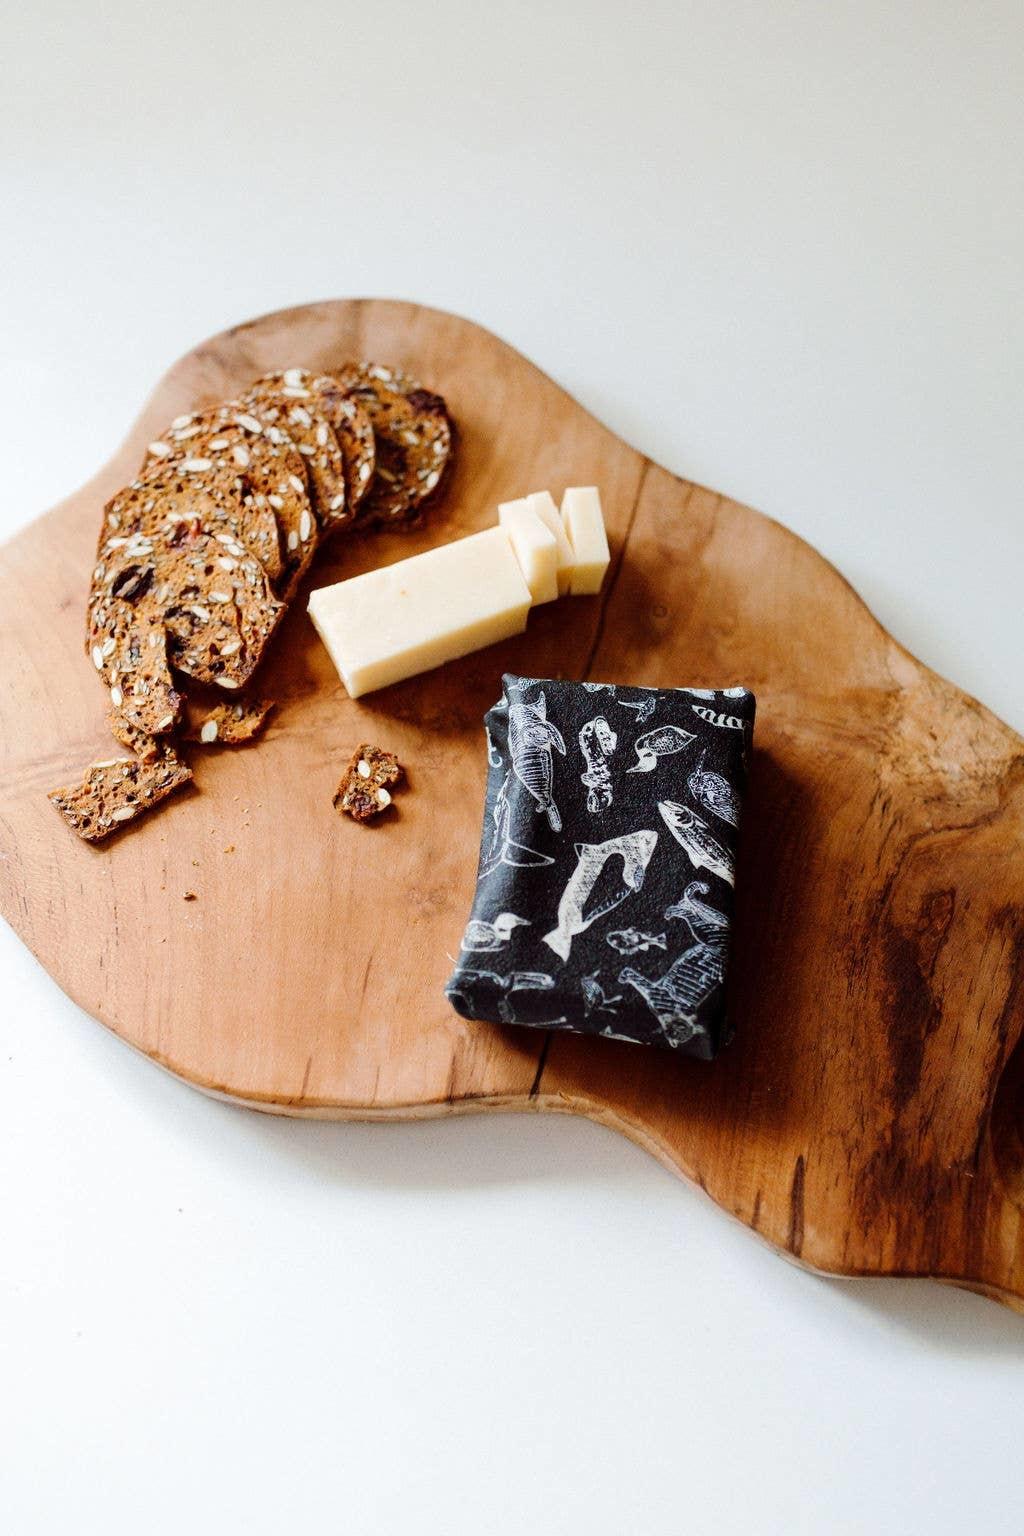 Goldilocks Sustainable Goods Species of Ucluelet Food Wrap Set of 3